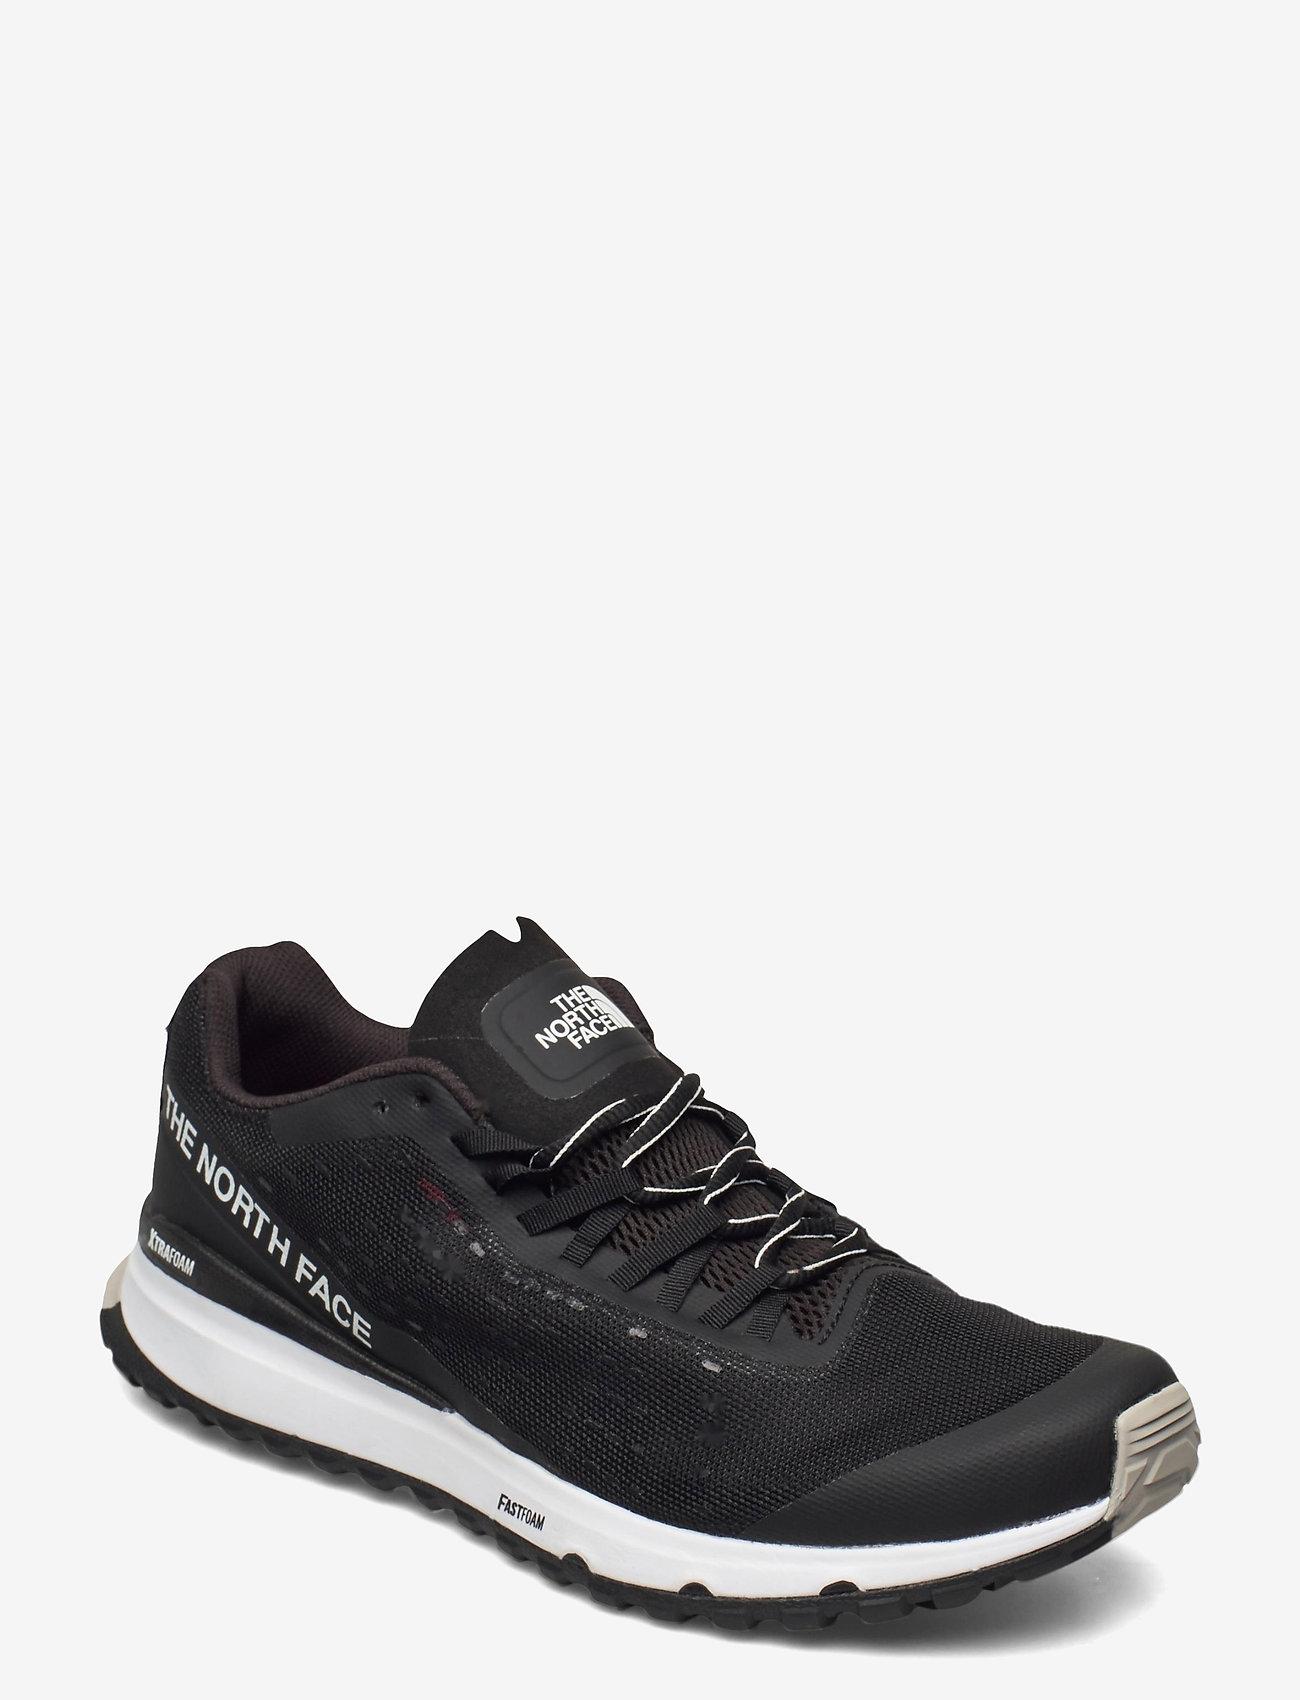 The North Face - M ULTRA SWIFT - chaussures de randonnée - tnf black/tnf white - 0